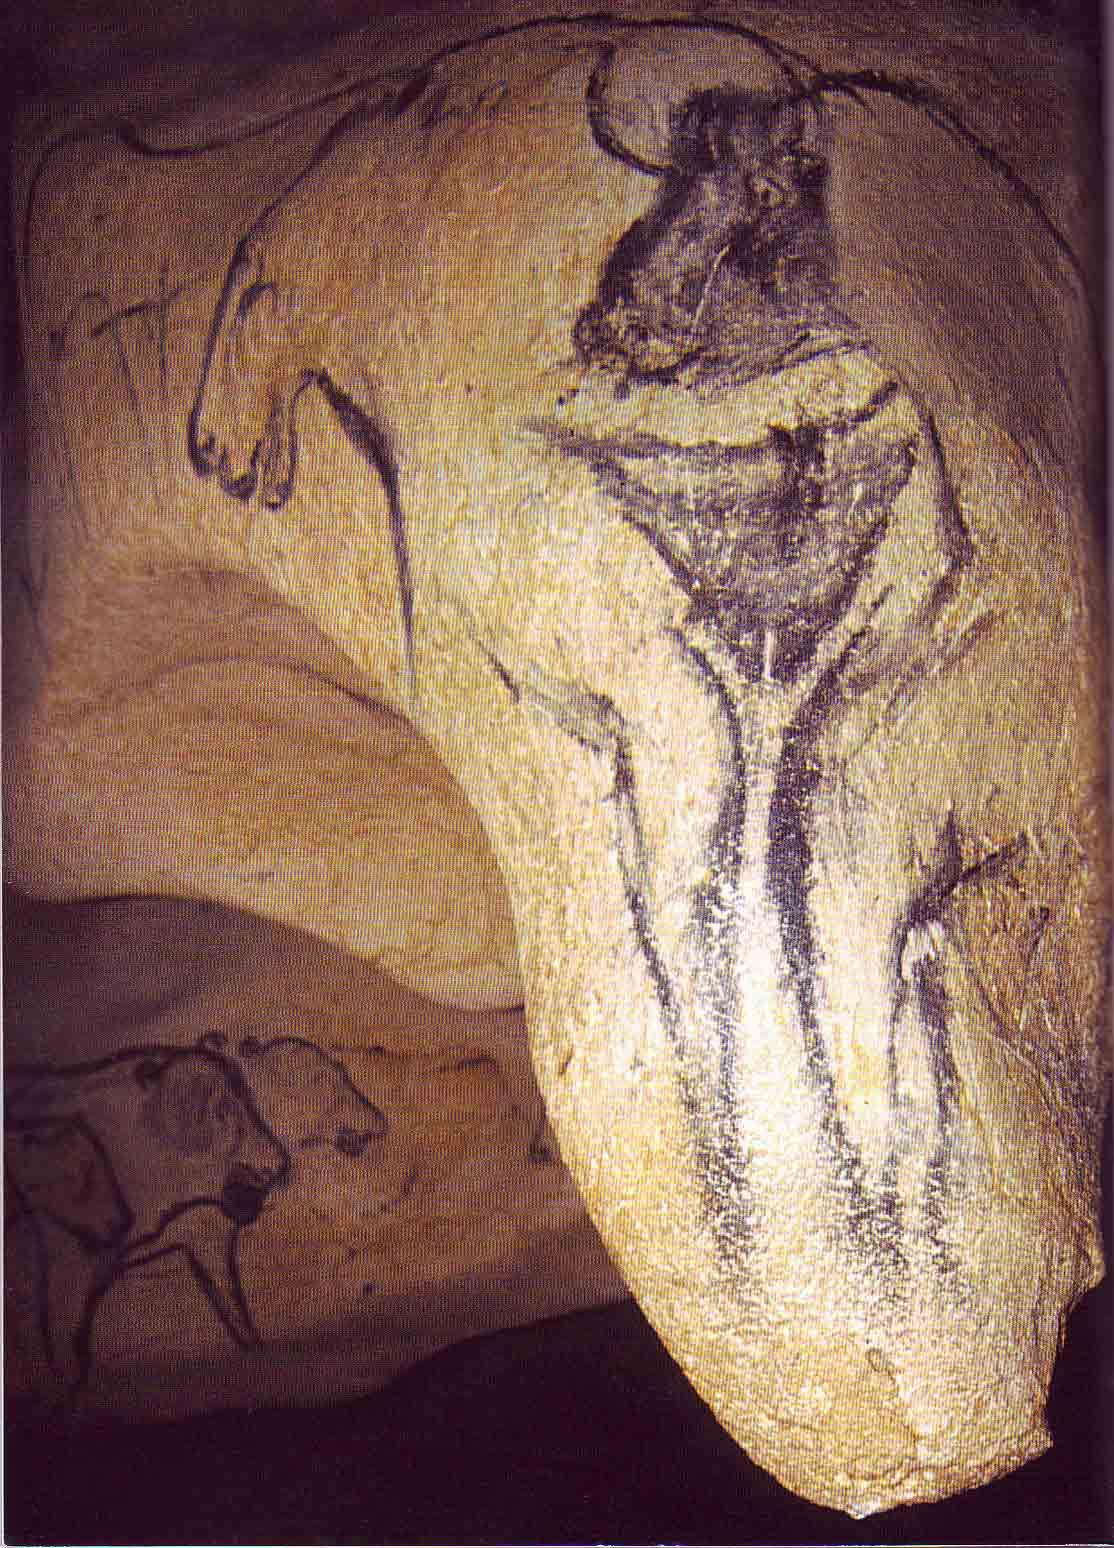 5. Venus-Chauvet